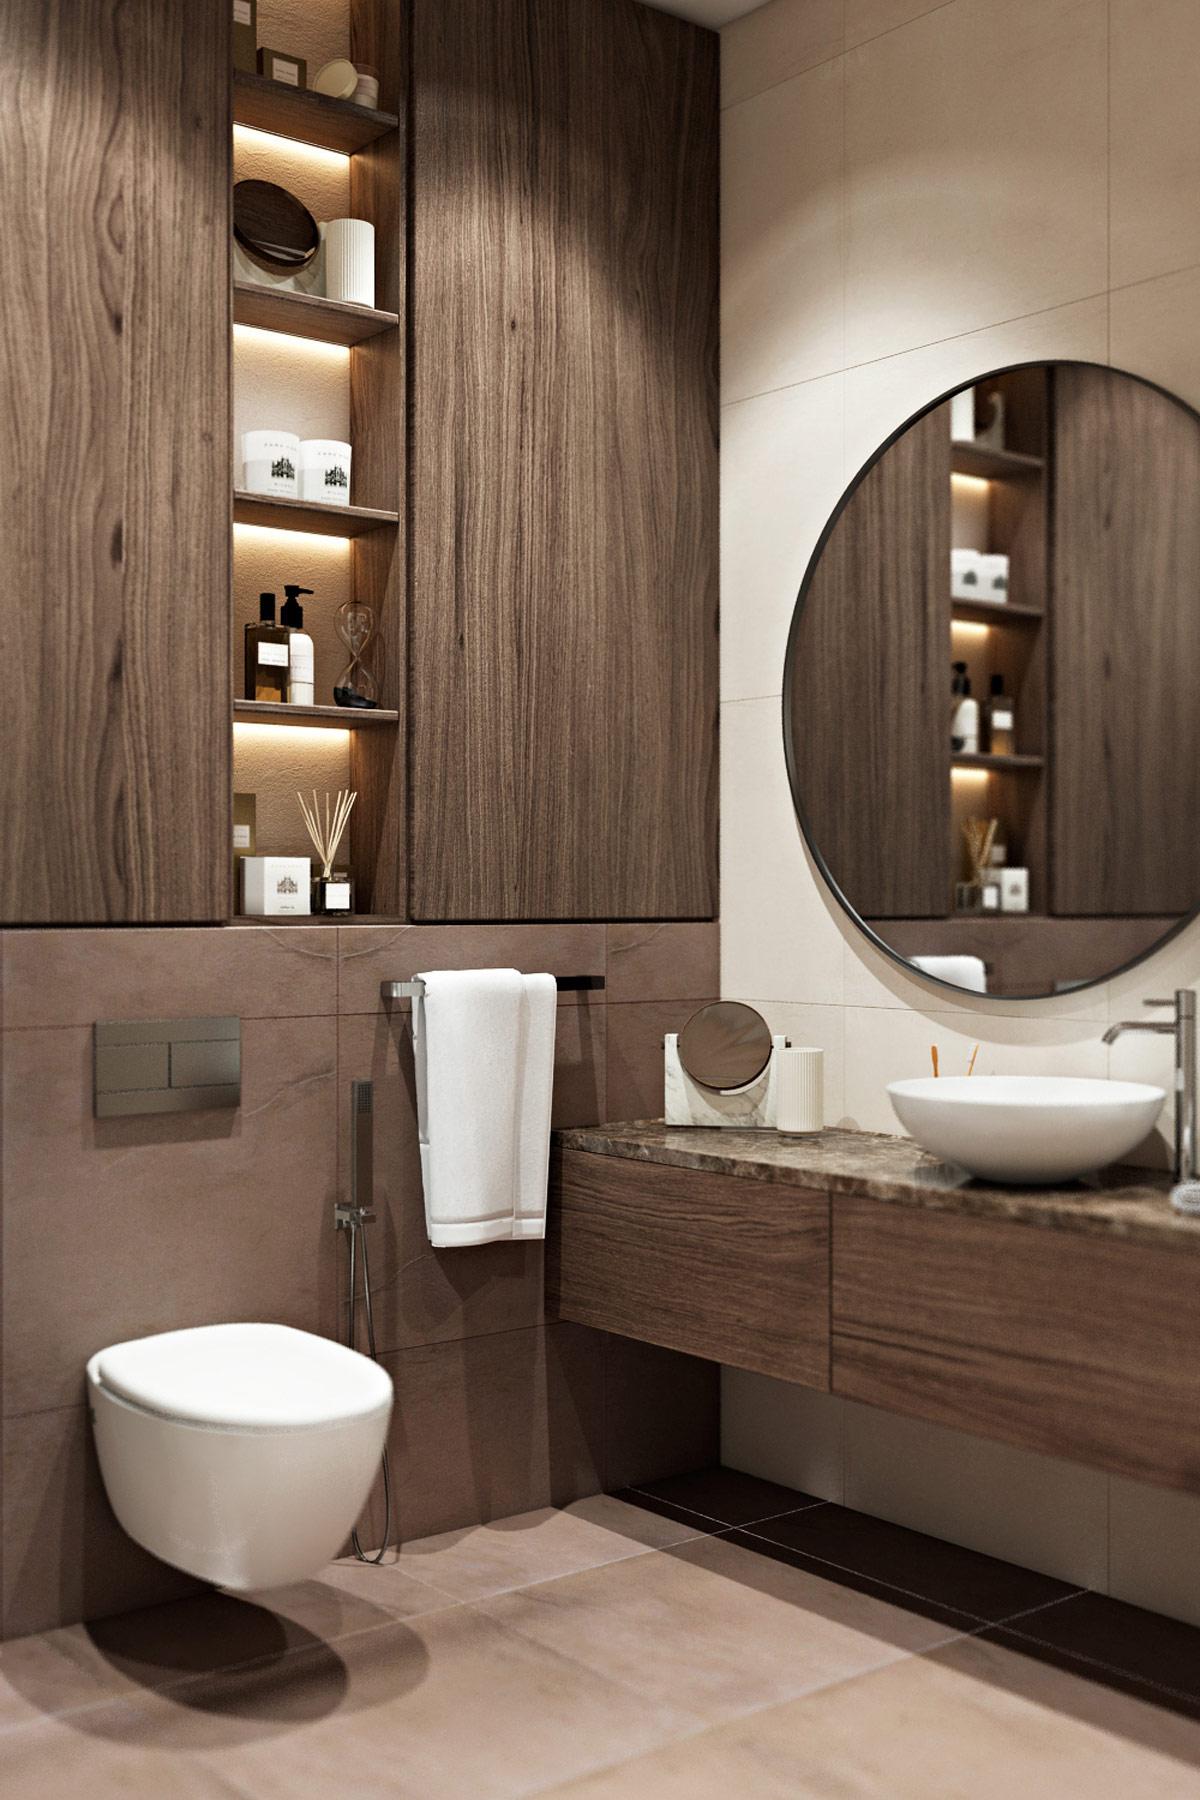 unique-storage-design-for-modern-master-bathroom-vertical-open-shelves-between-cabinets